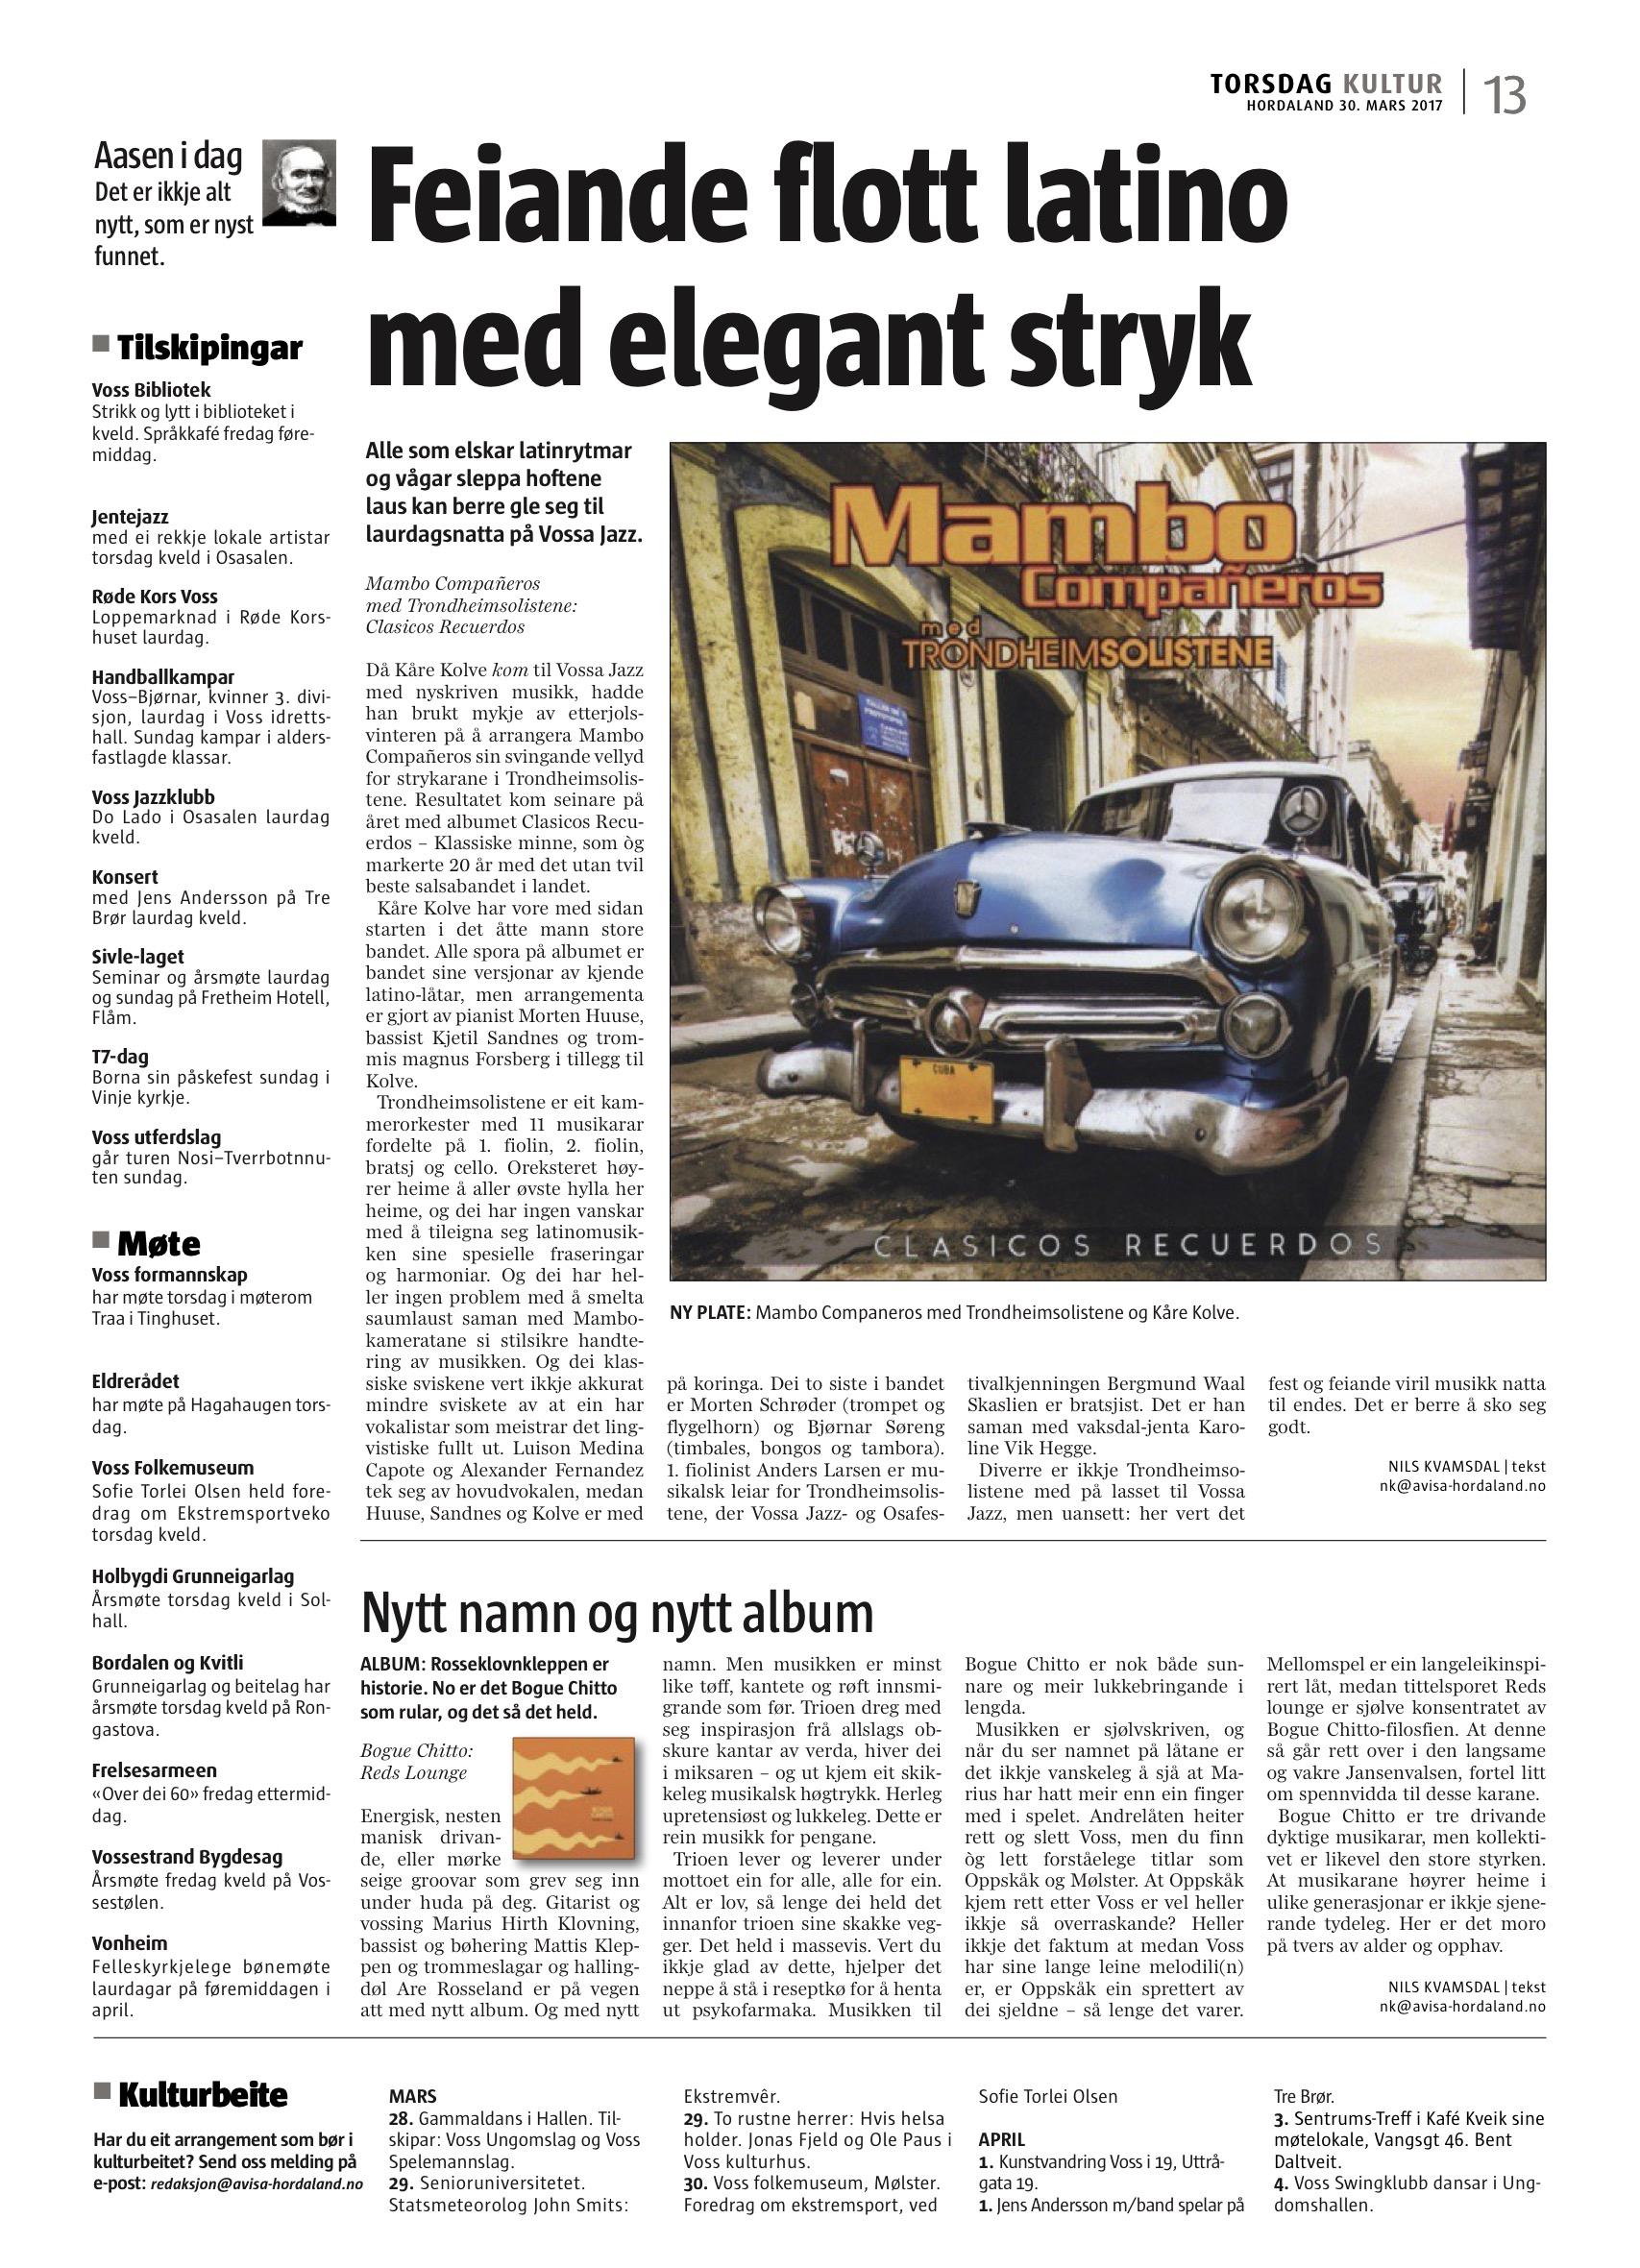 2017-03-30 Hordaland s.13 (1)